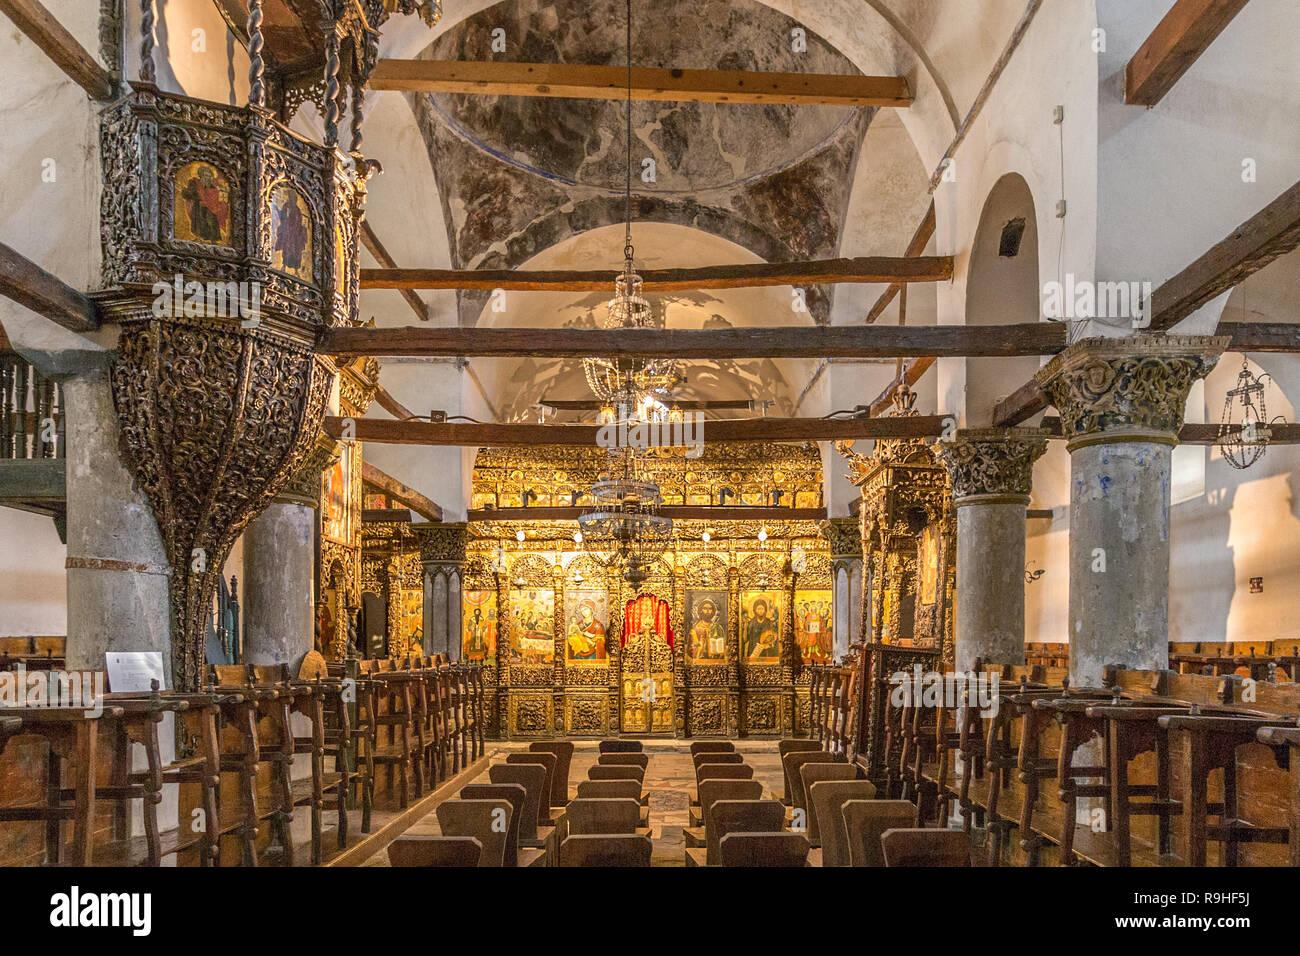 interior-of-church-berat-castle-old-town-orthodox-church-albania-R9HF5J.jpg